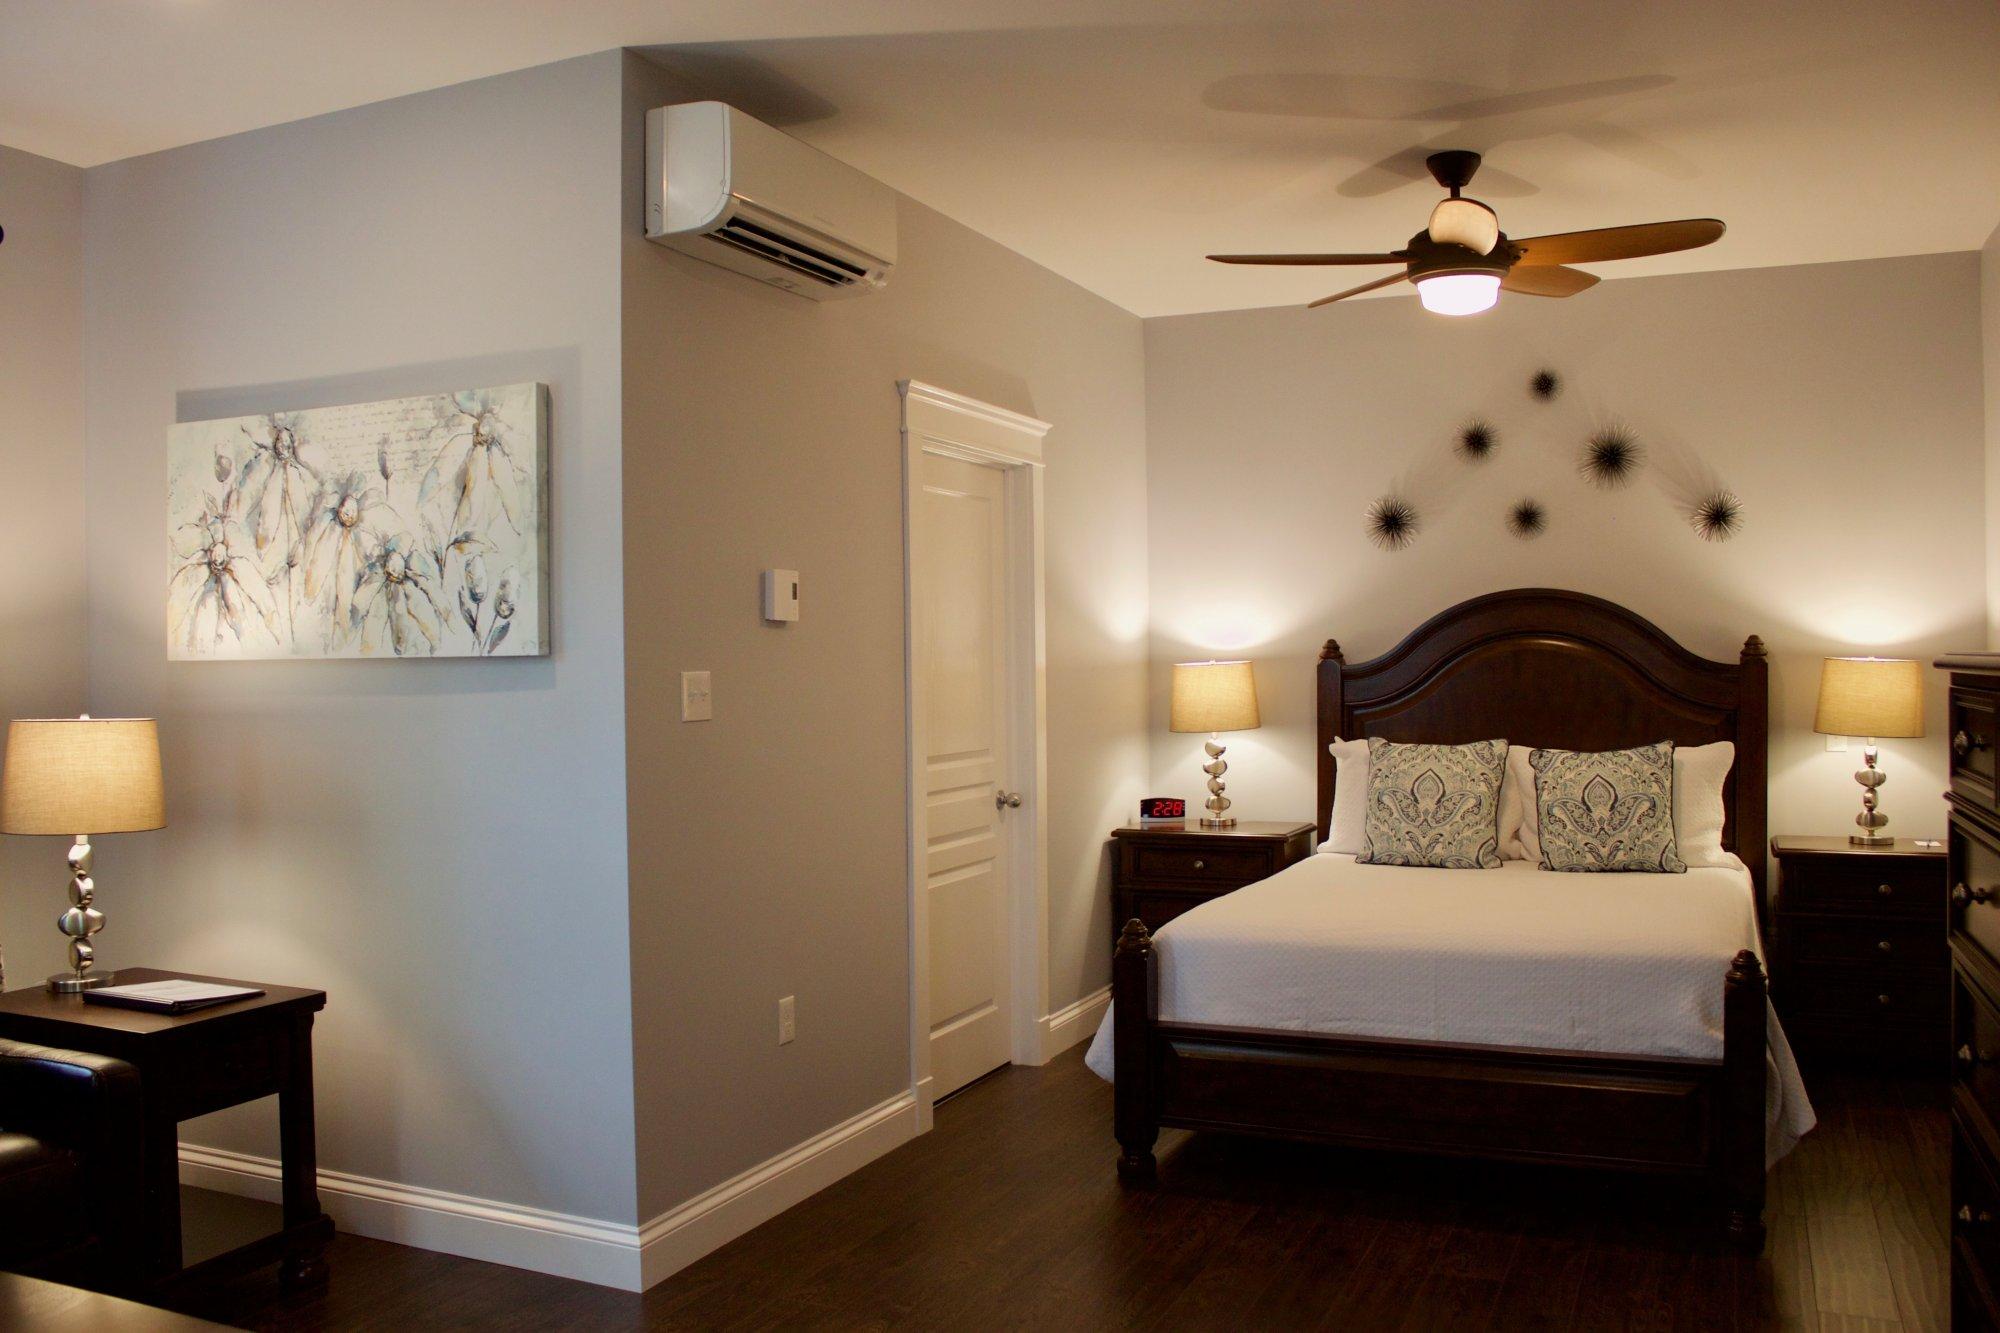 Room 12 at the Tattingstone Inn